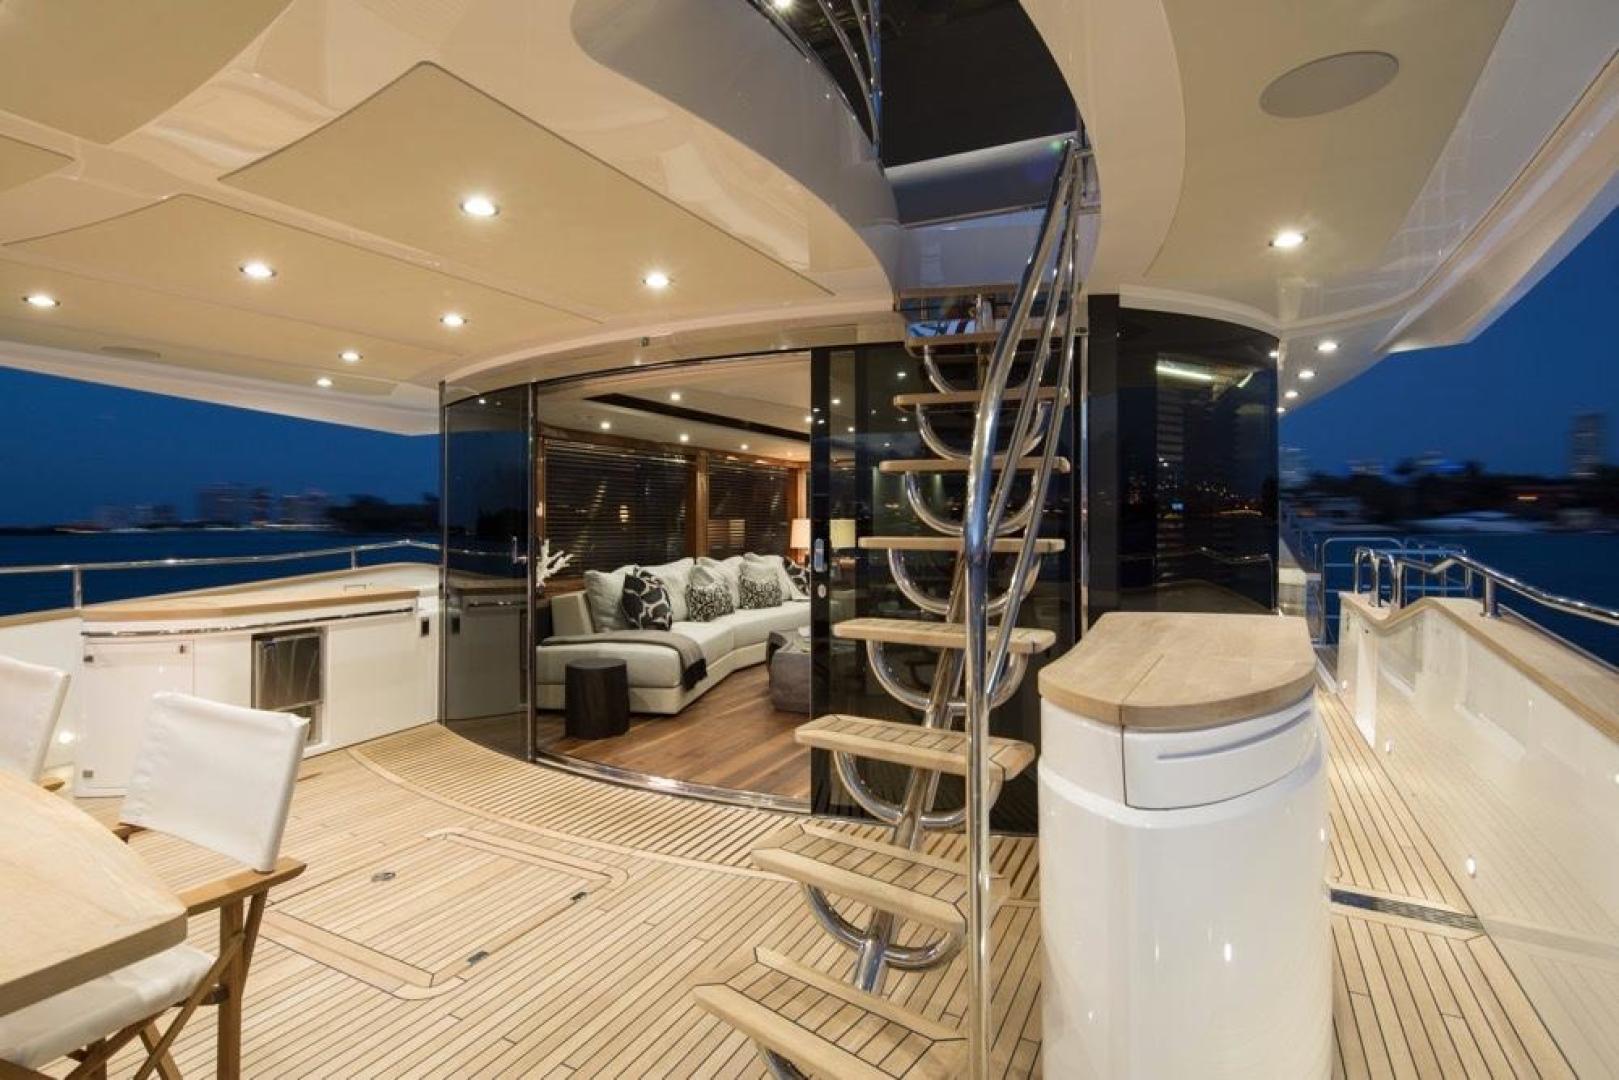 Sunseeker-28 Metre Yacht 2016-RIII Miami-Florida-United States-2016 SUNSEEKER 92 RIII FOR SALE-600092 | Thumbnail